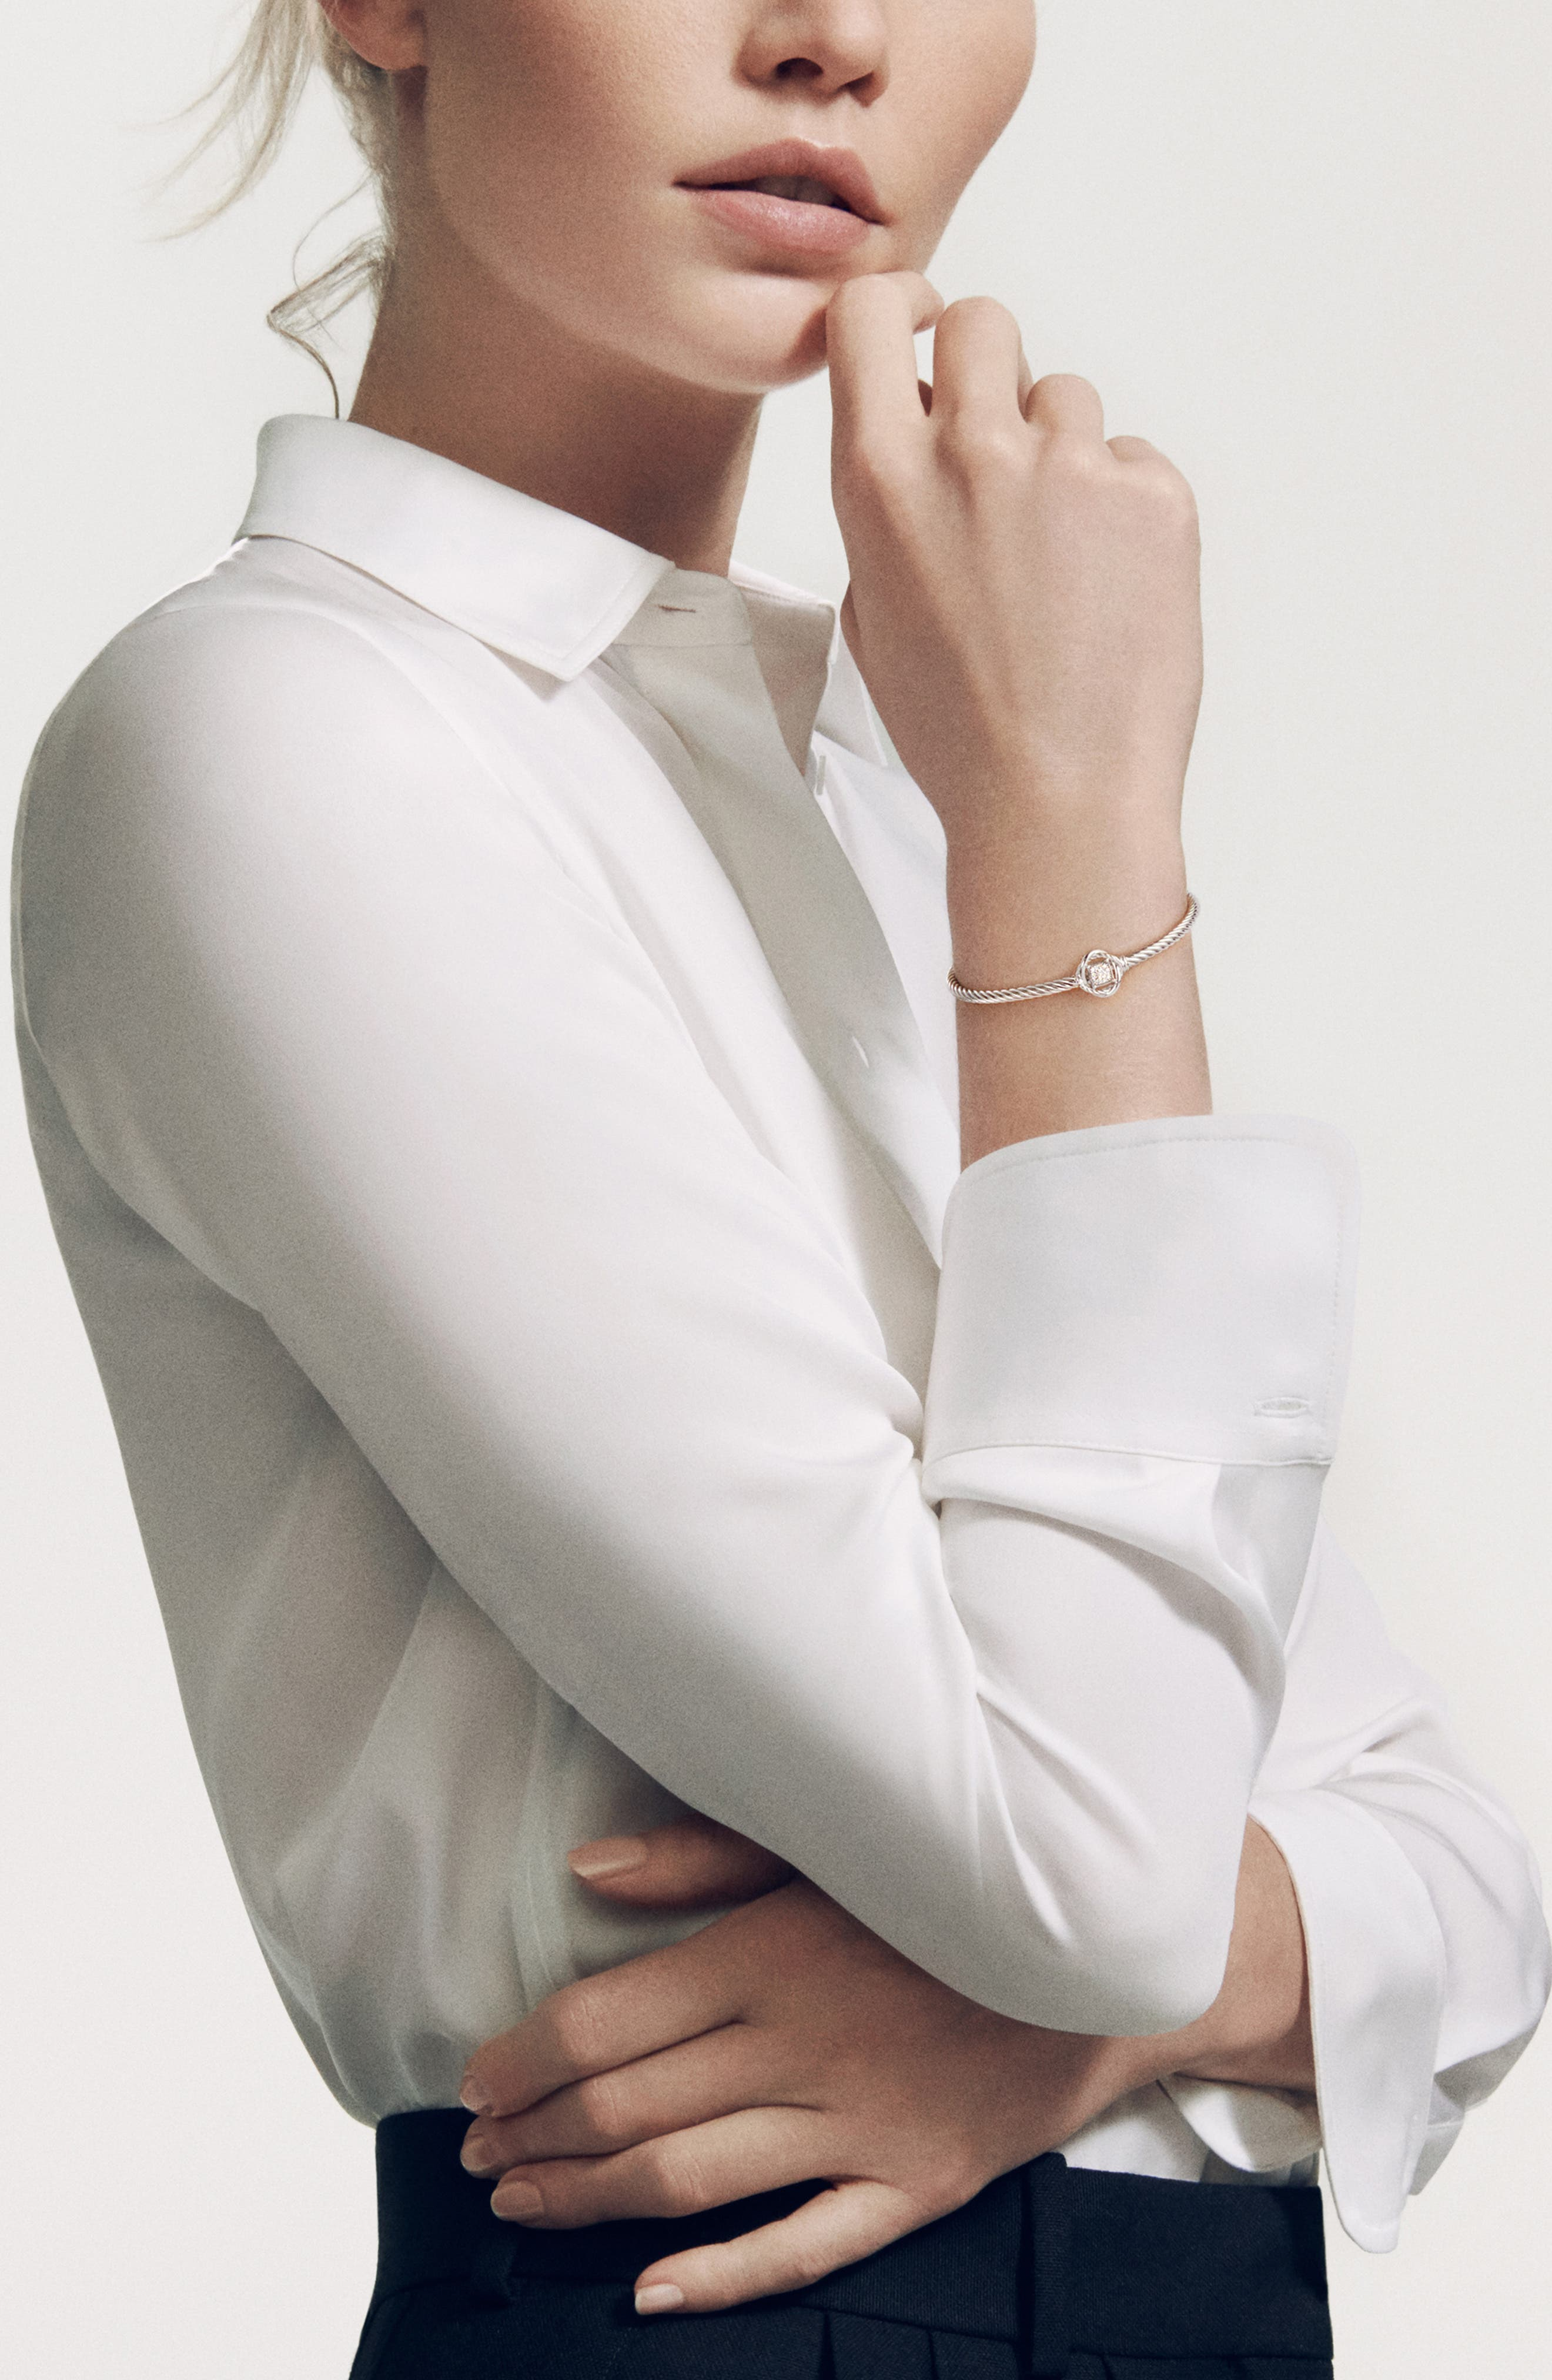 DAVID YURMAN, 'Infinity' Bracelet with Diamonds, Alternate thumbnail 2, color, DIAMOND